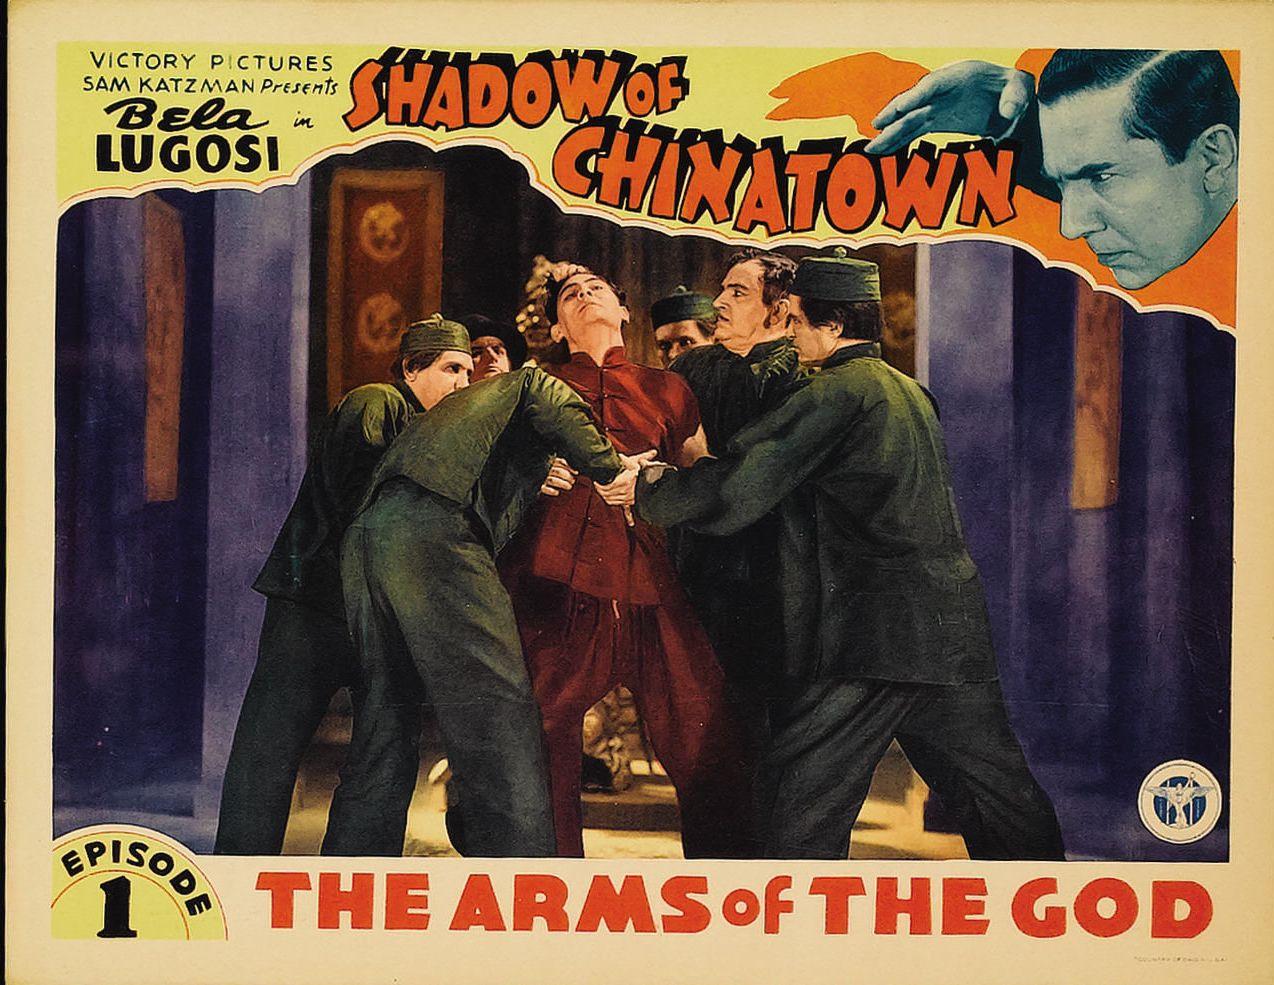 Bela Lugosi and John Cowell in Shadow of Chinatown (1936)